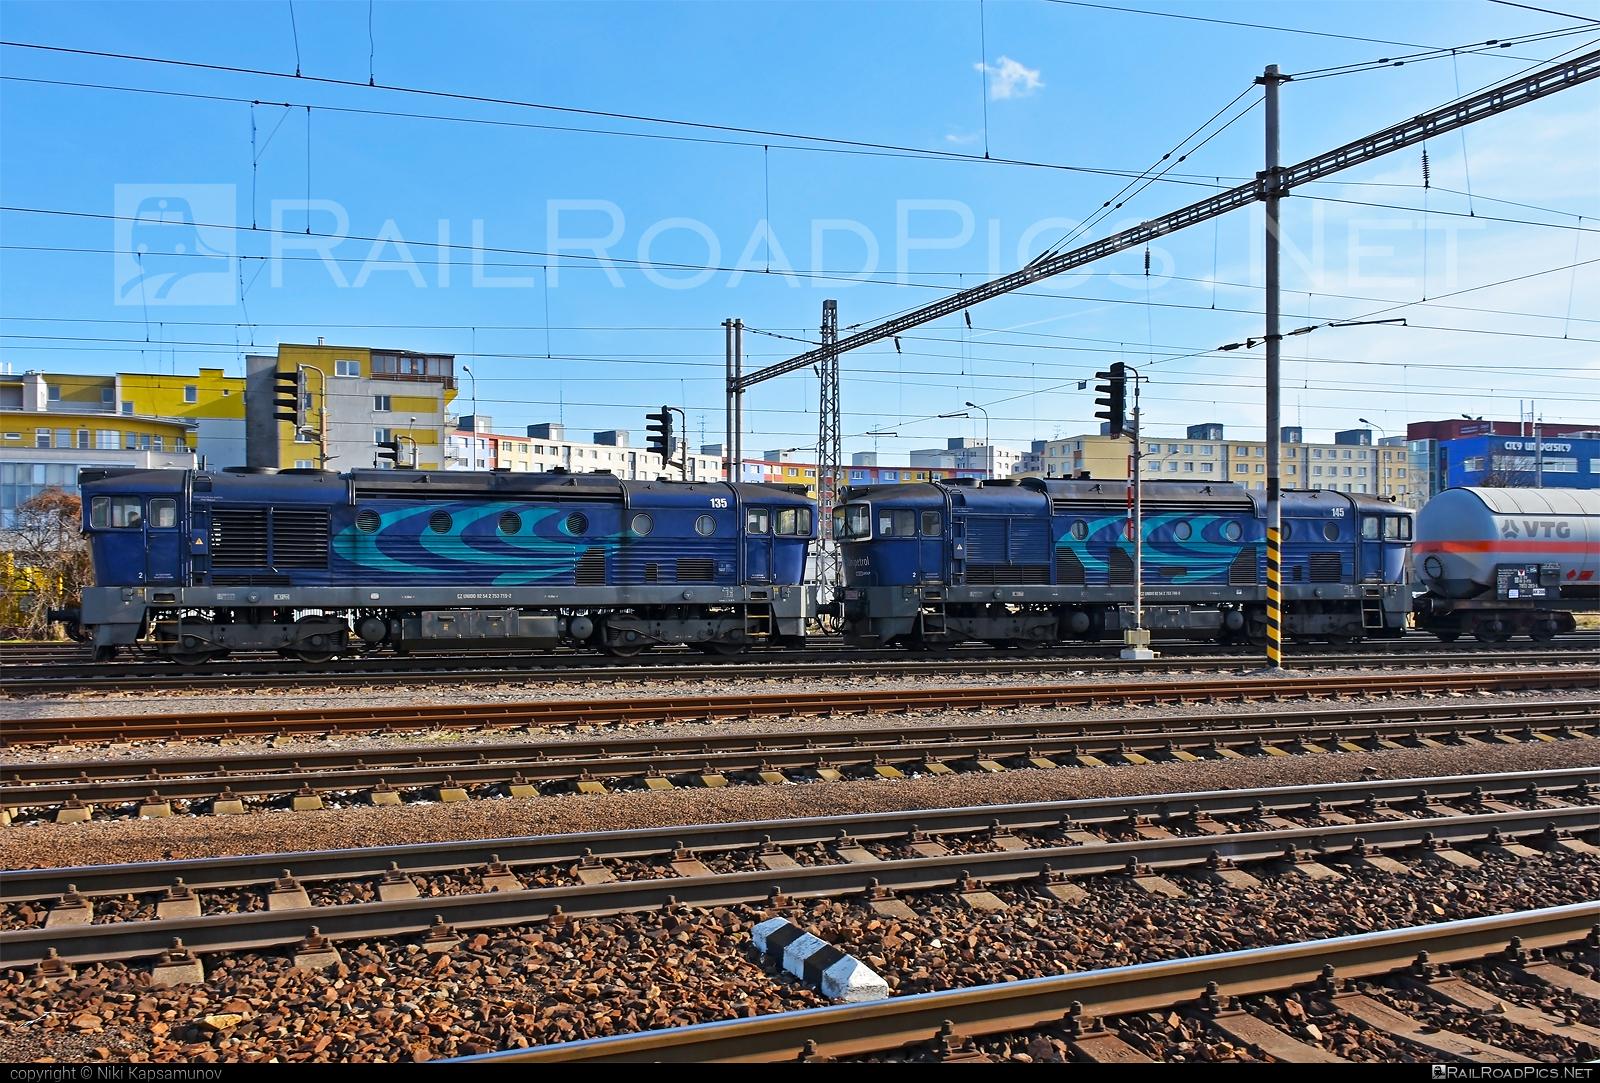 ČKD T 478.3 (753) - 753 715-2 operated by UNIPETROL DOPRAVA, a.s. #brejlovec #ckd #ckdclass753 #ckdt4783 #locomotive753 #okuliarnik #unido #unipetrol